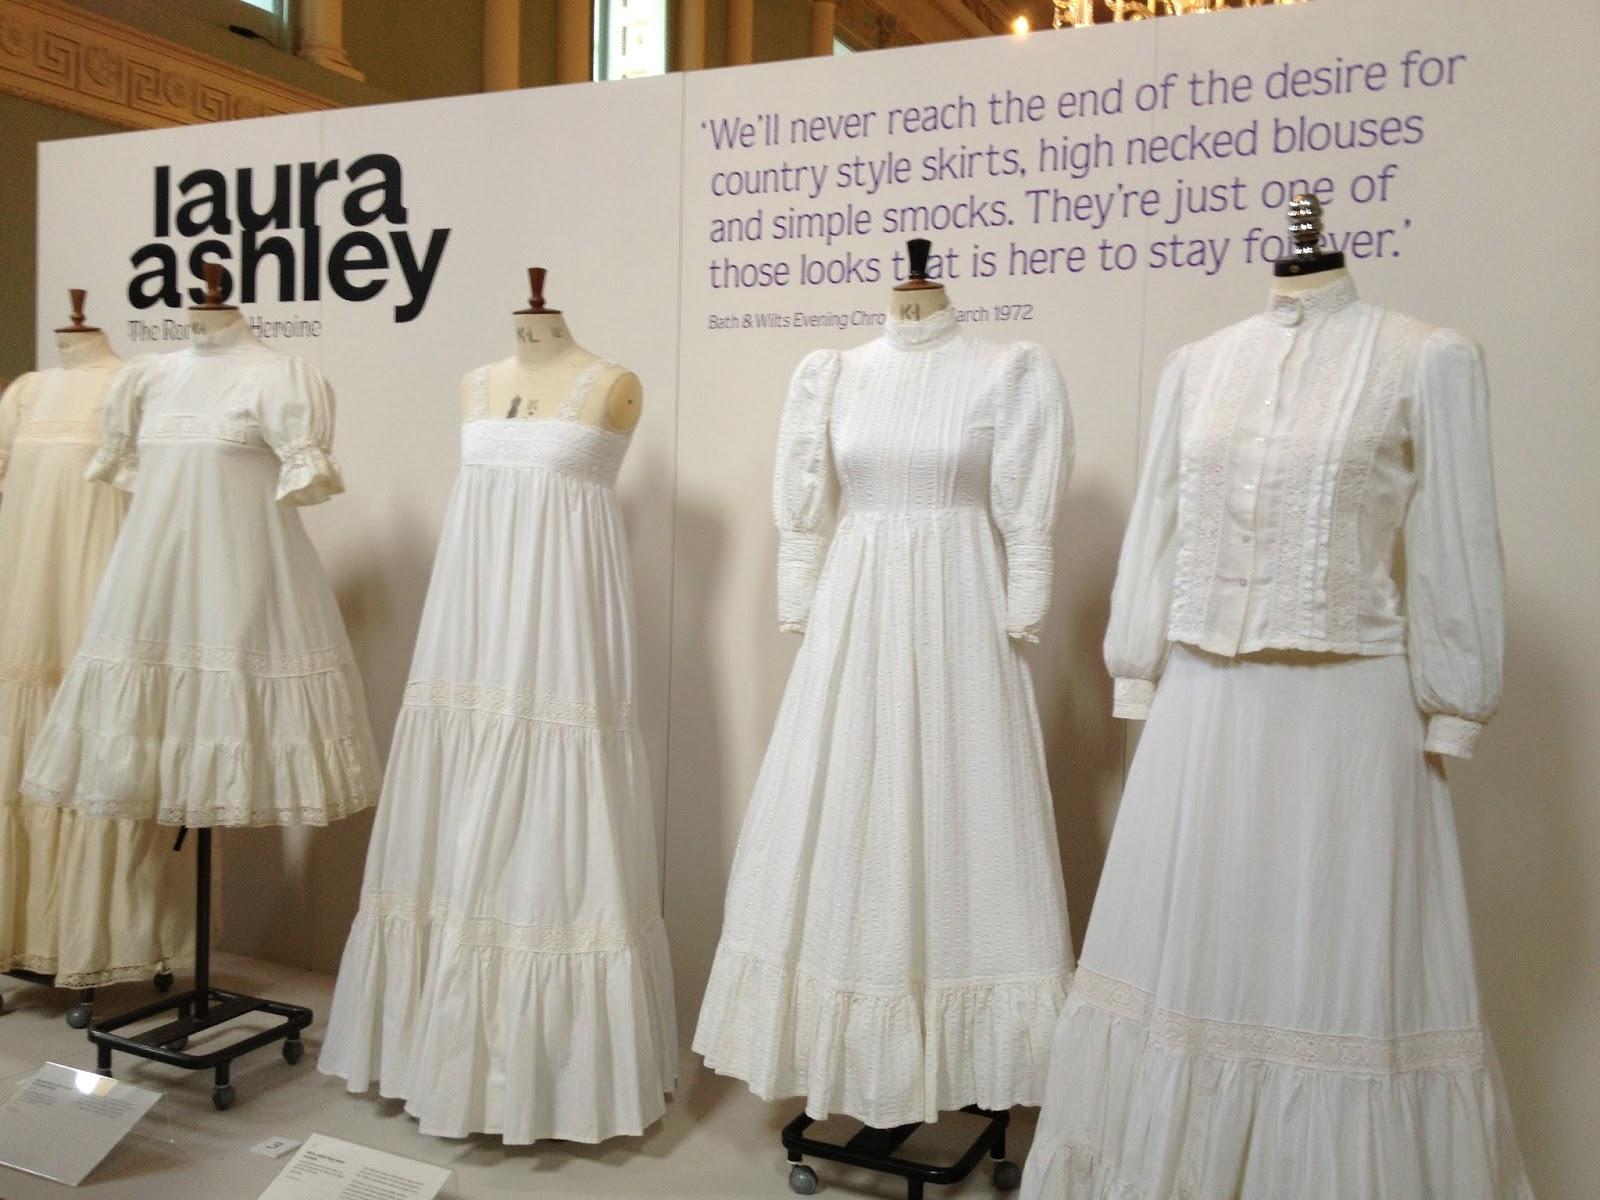 Aptly Led The E Exhibit Displays 100 Of Laura Ashley S Clic 1970s Dresses